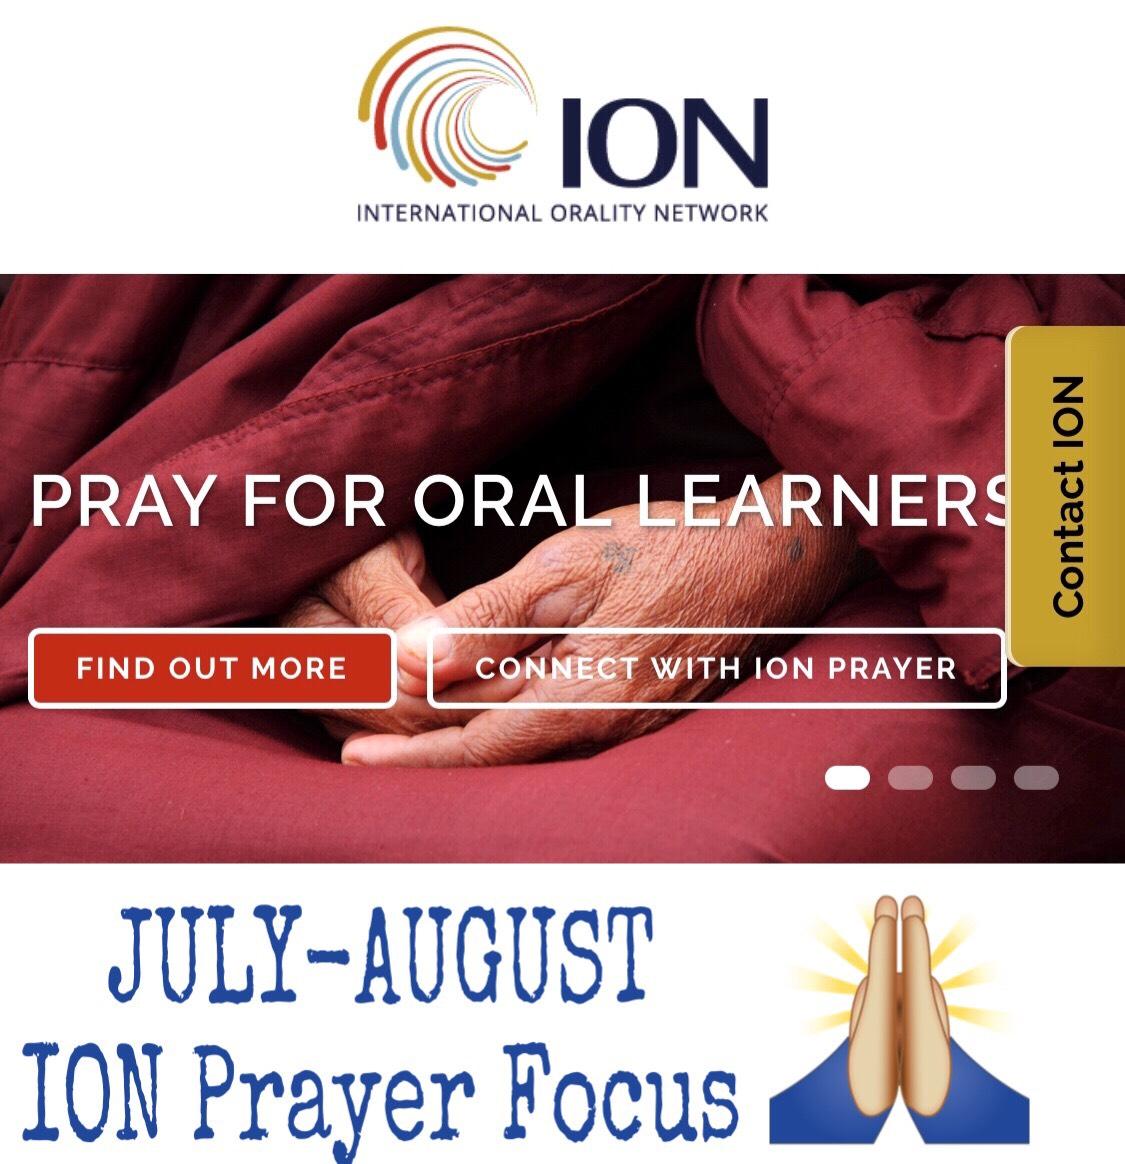 July August ION Prayer Focus